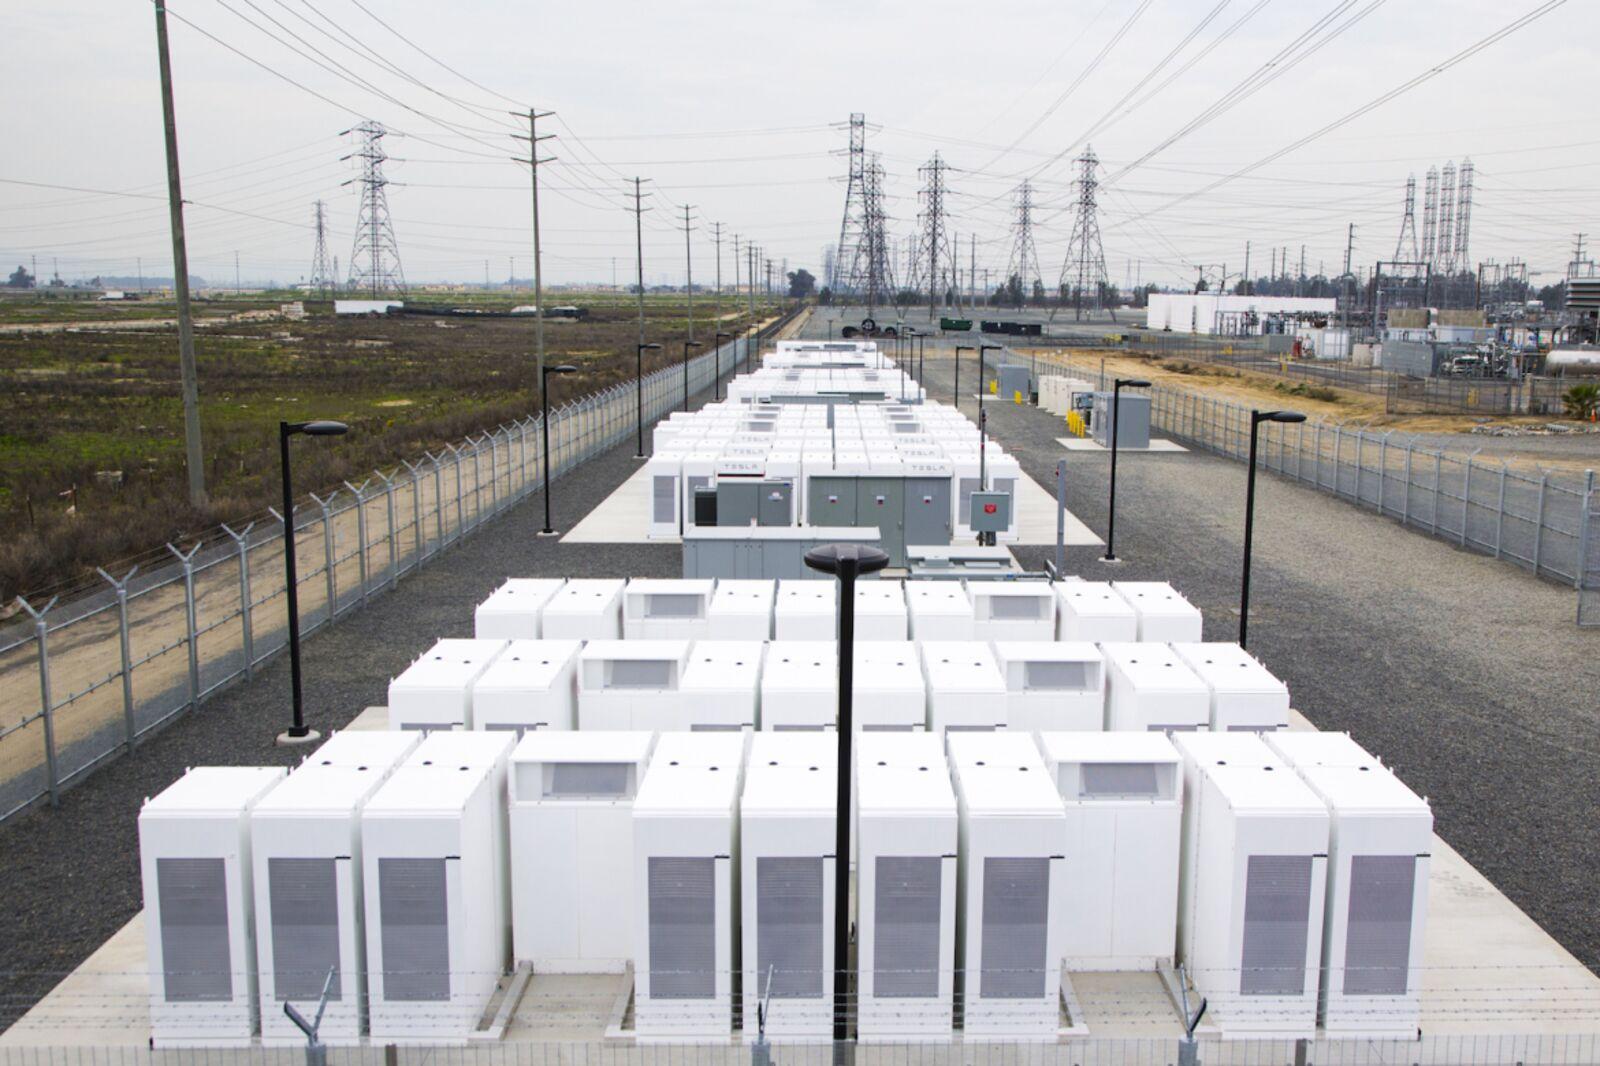 Southern California Edison/Tesla battery-storage power plant